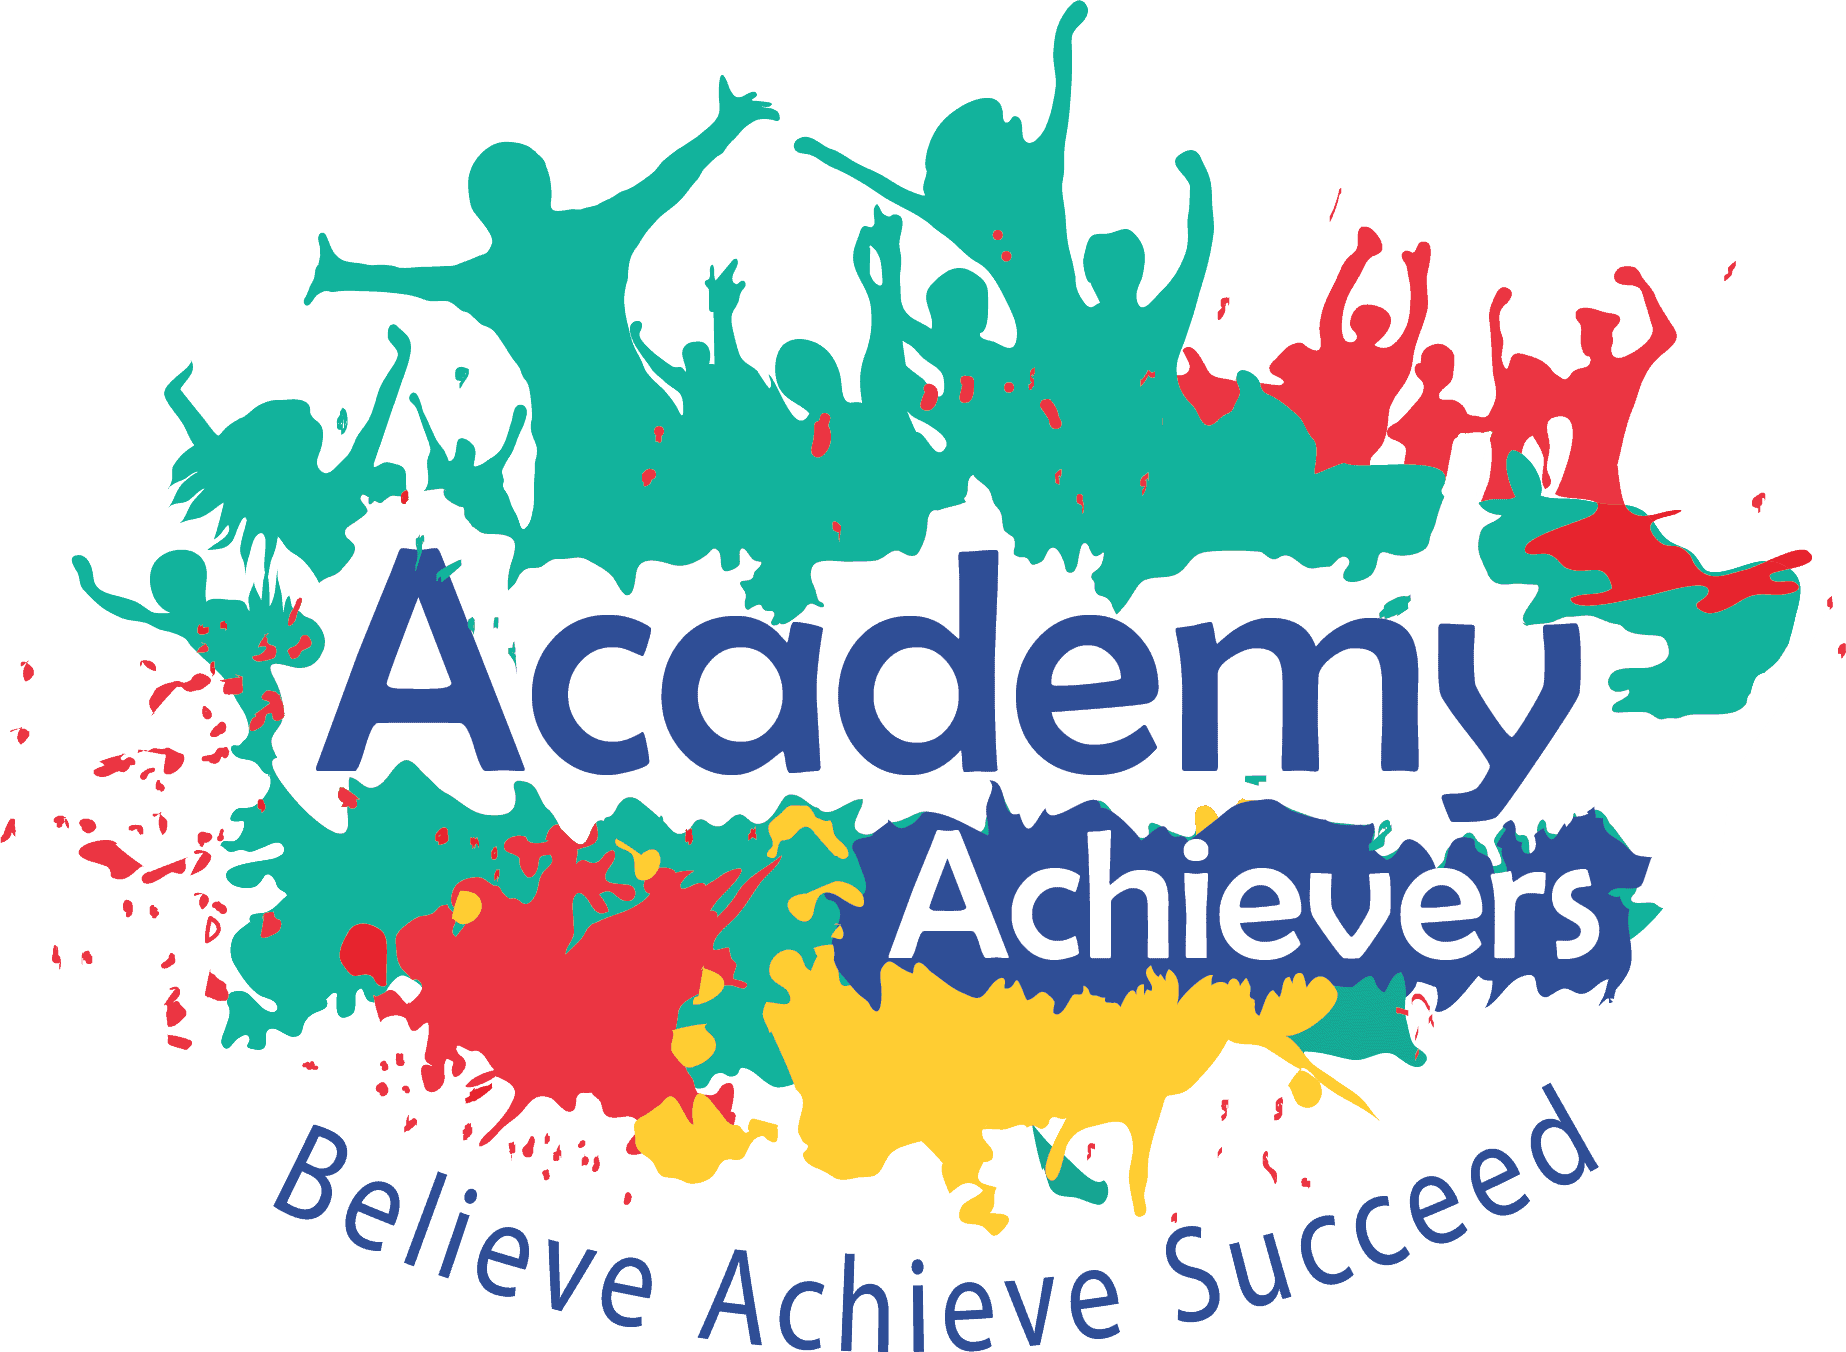 Academy Acheivers